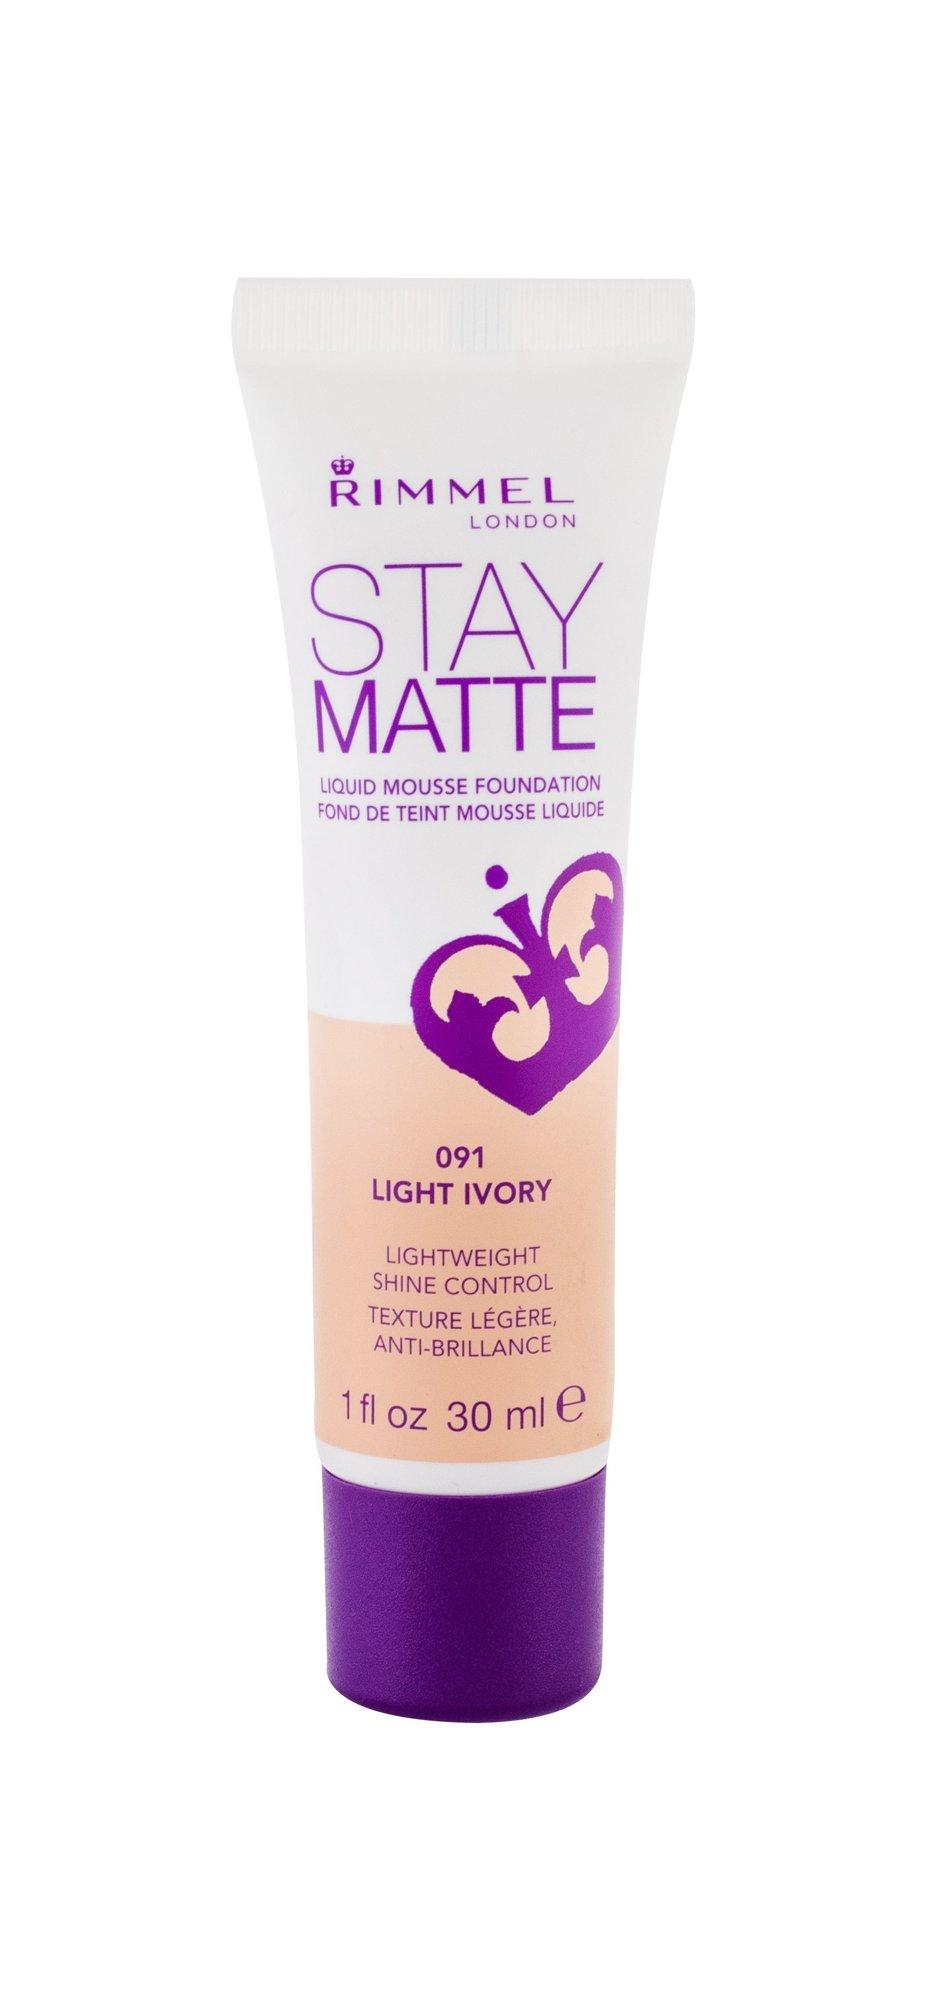 Rimmel London Stay Matte Makeup 30ml 091 Light Ivory